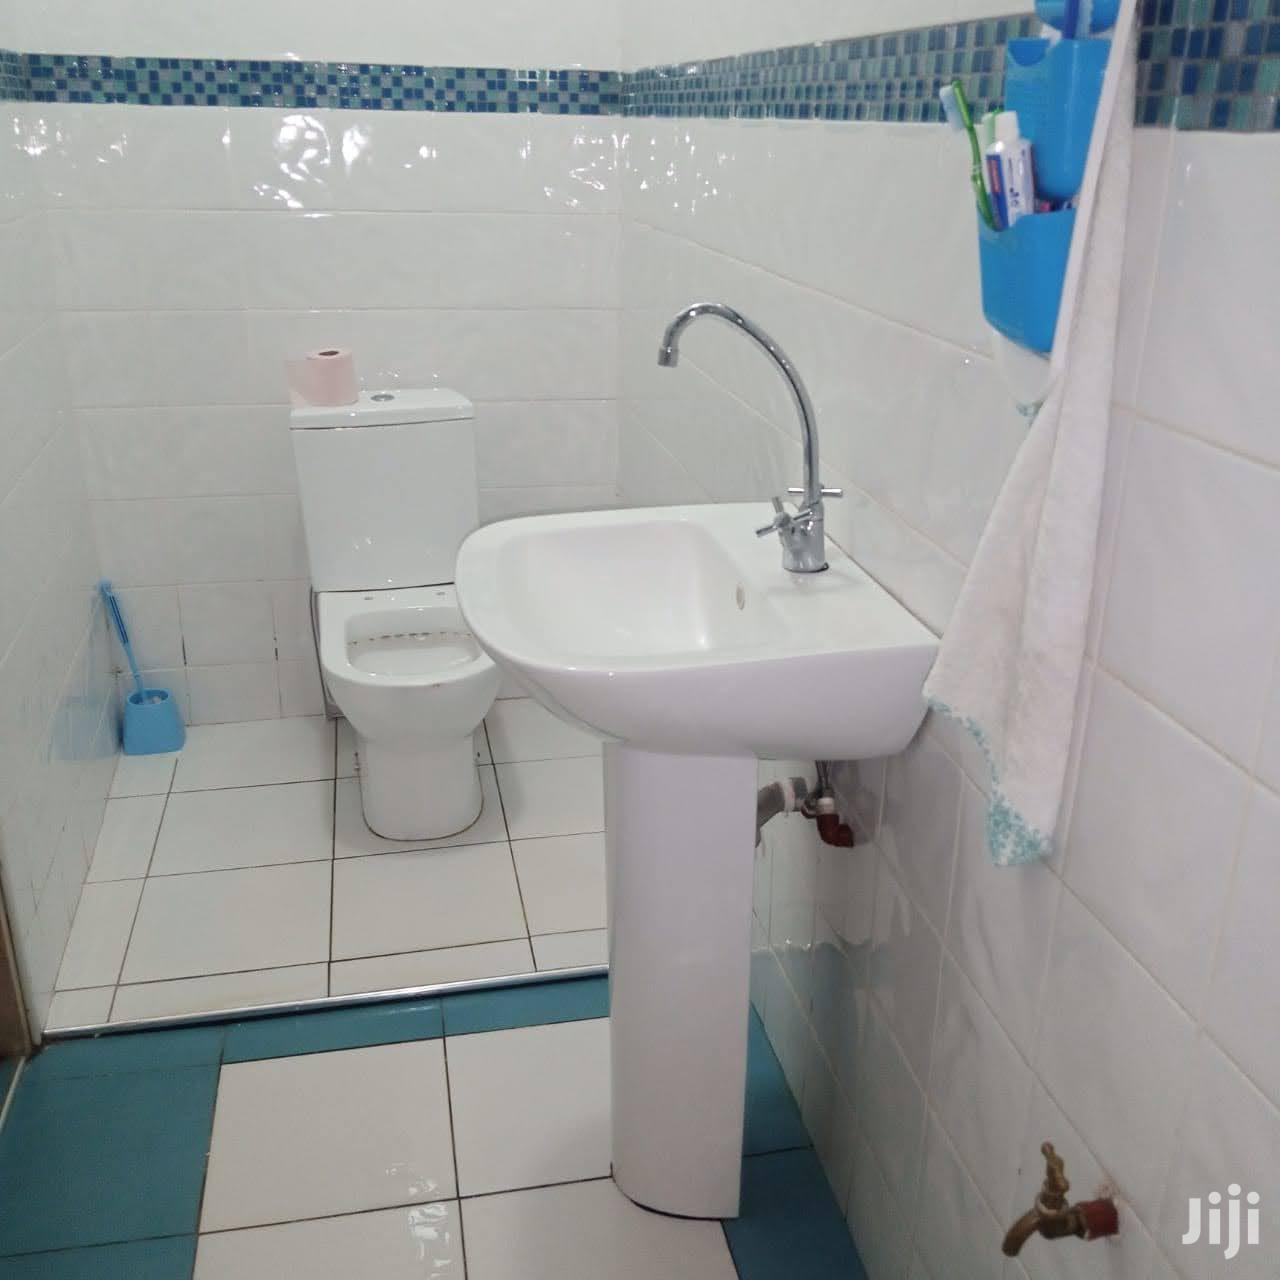 4bedroom Bungalow For Sale | Houses & Apartments For Sale for sale in Eldoret CBD, Uasin Gishu, Kenya